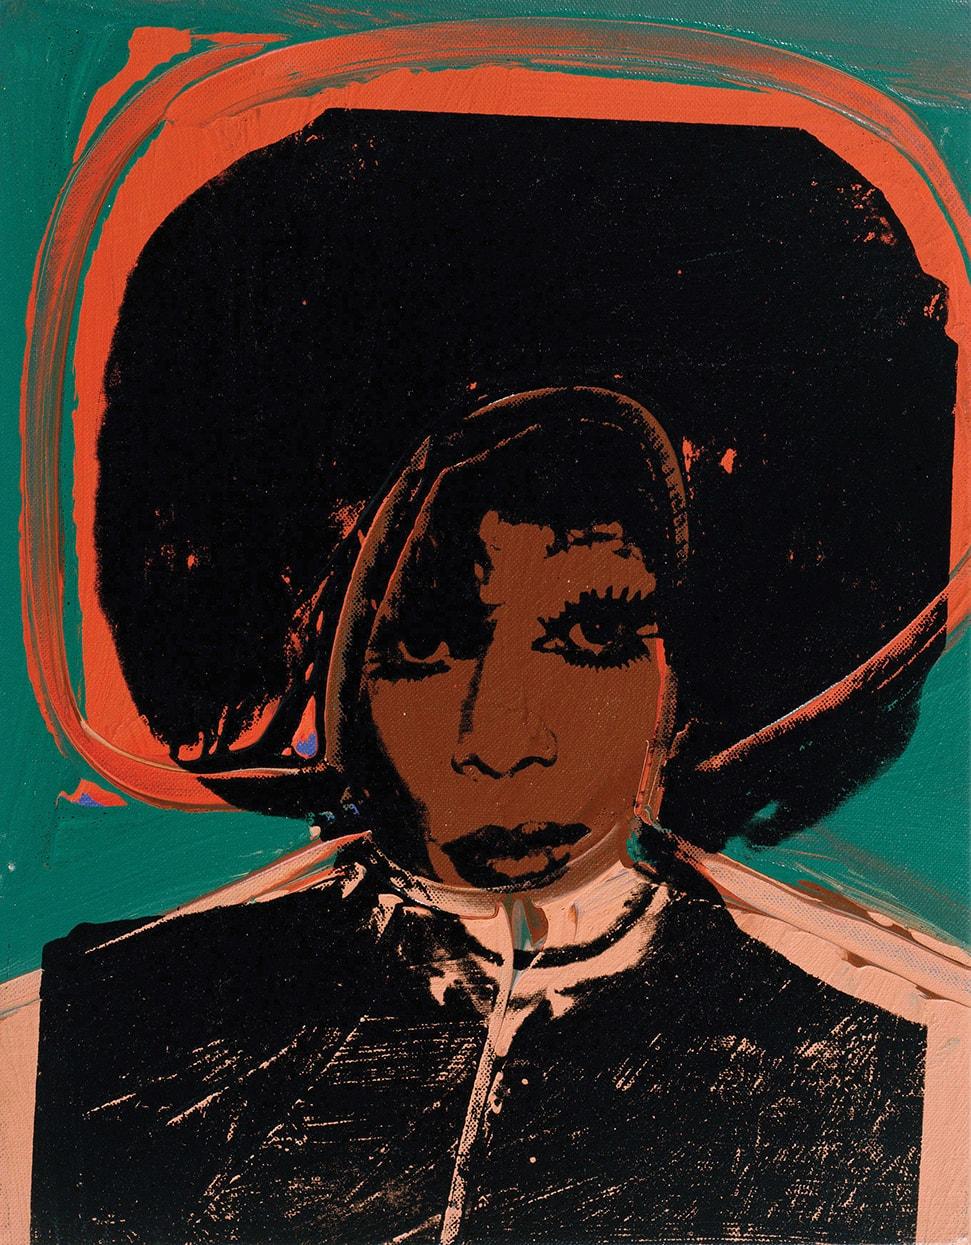 Andy-Warhol-Ladies and Gentlemen Helen Harry Morales